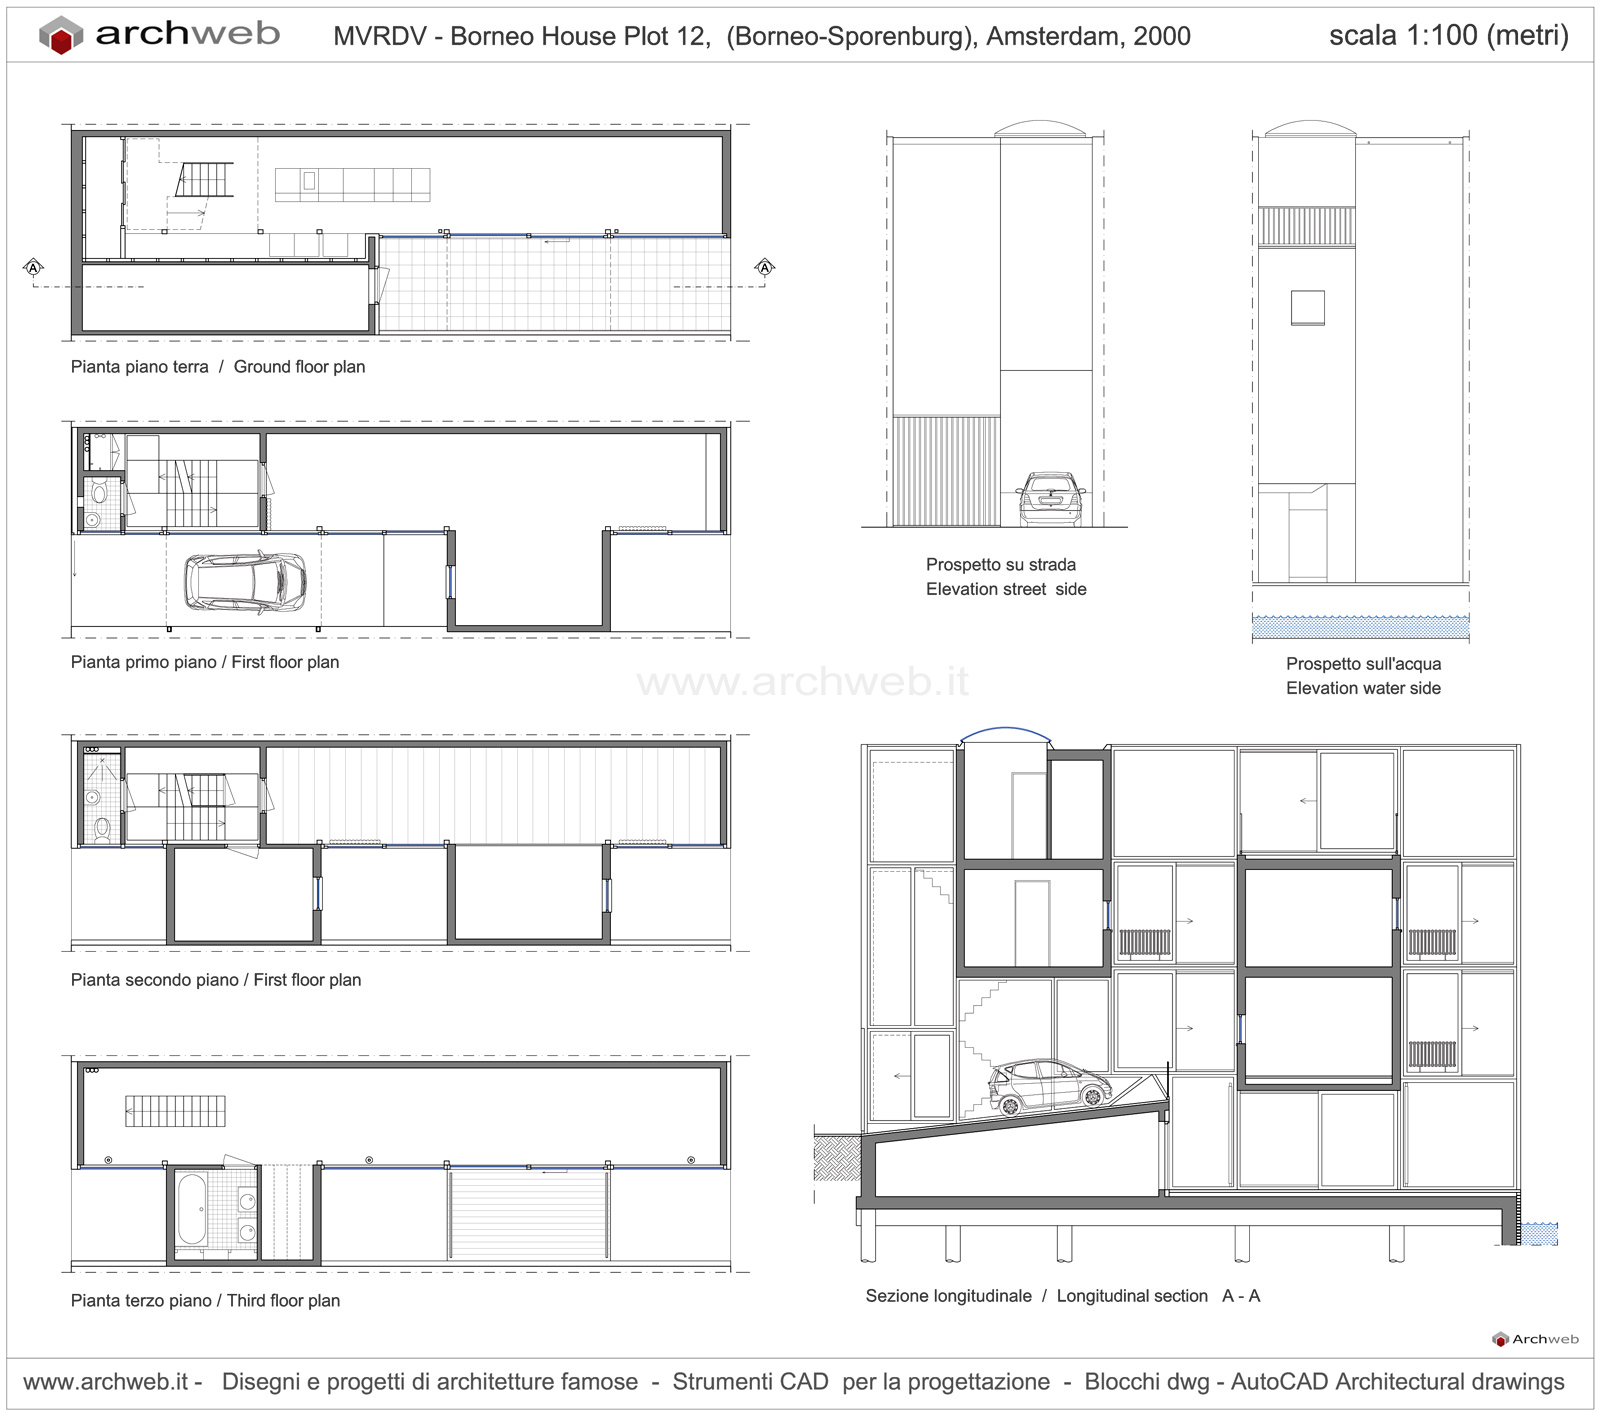 MVRDV Plot 12 house drawings plan